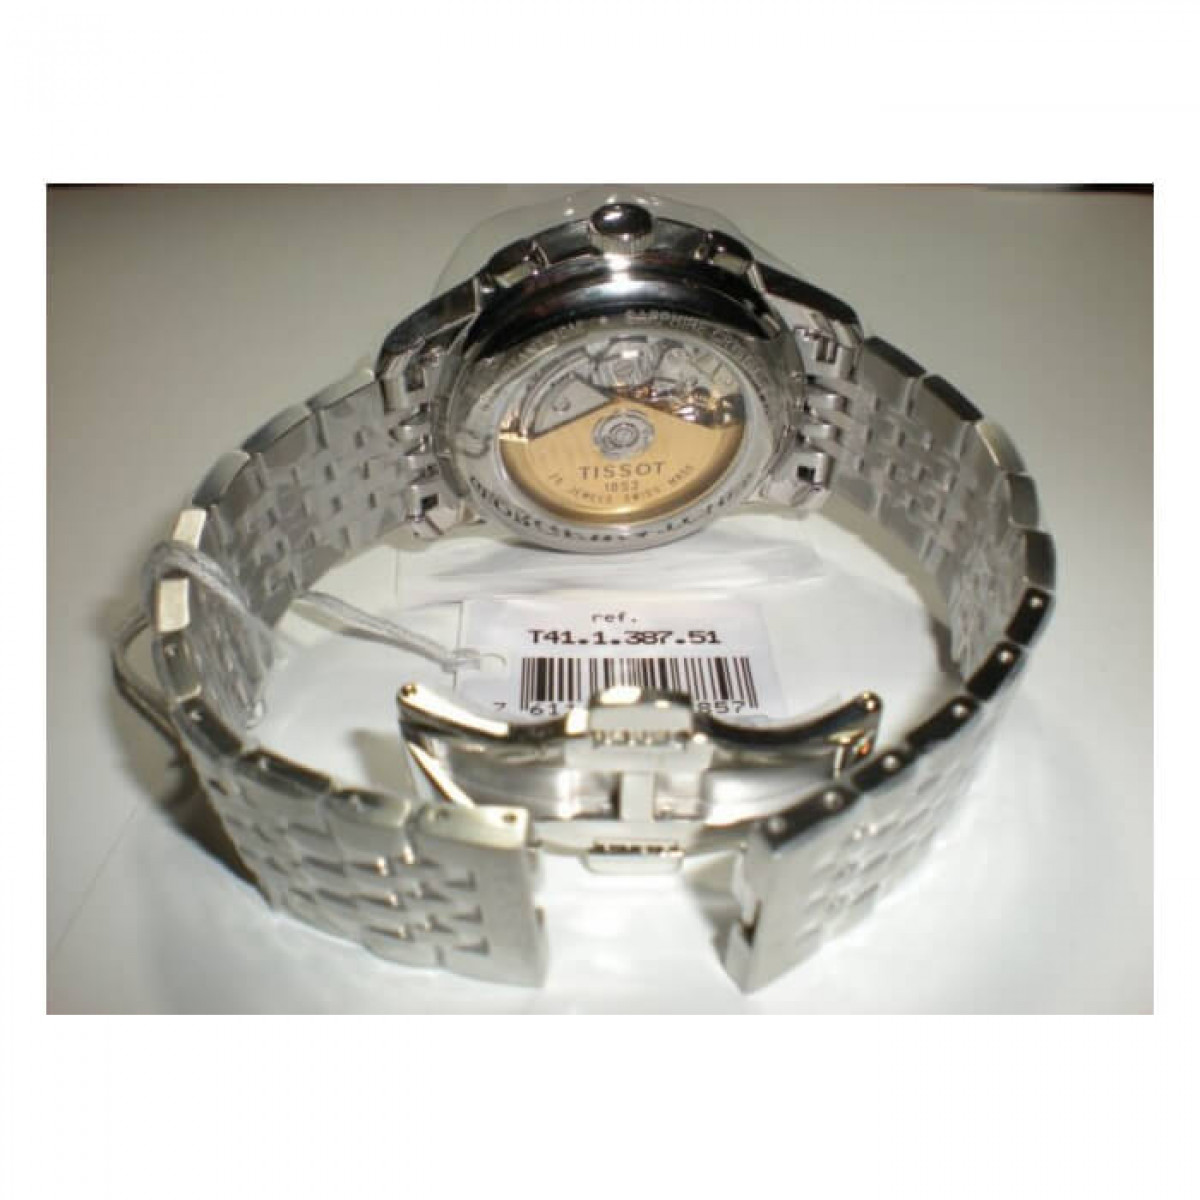 Часовник Tissot T41.1.387.51